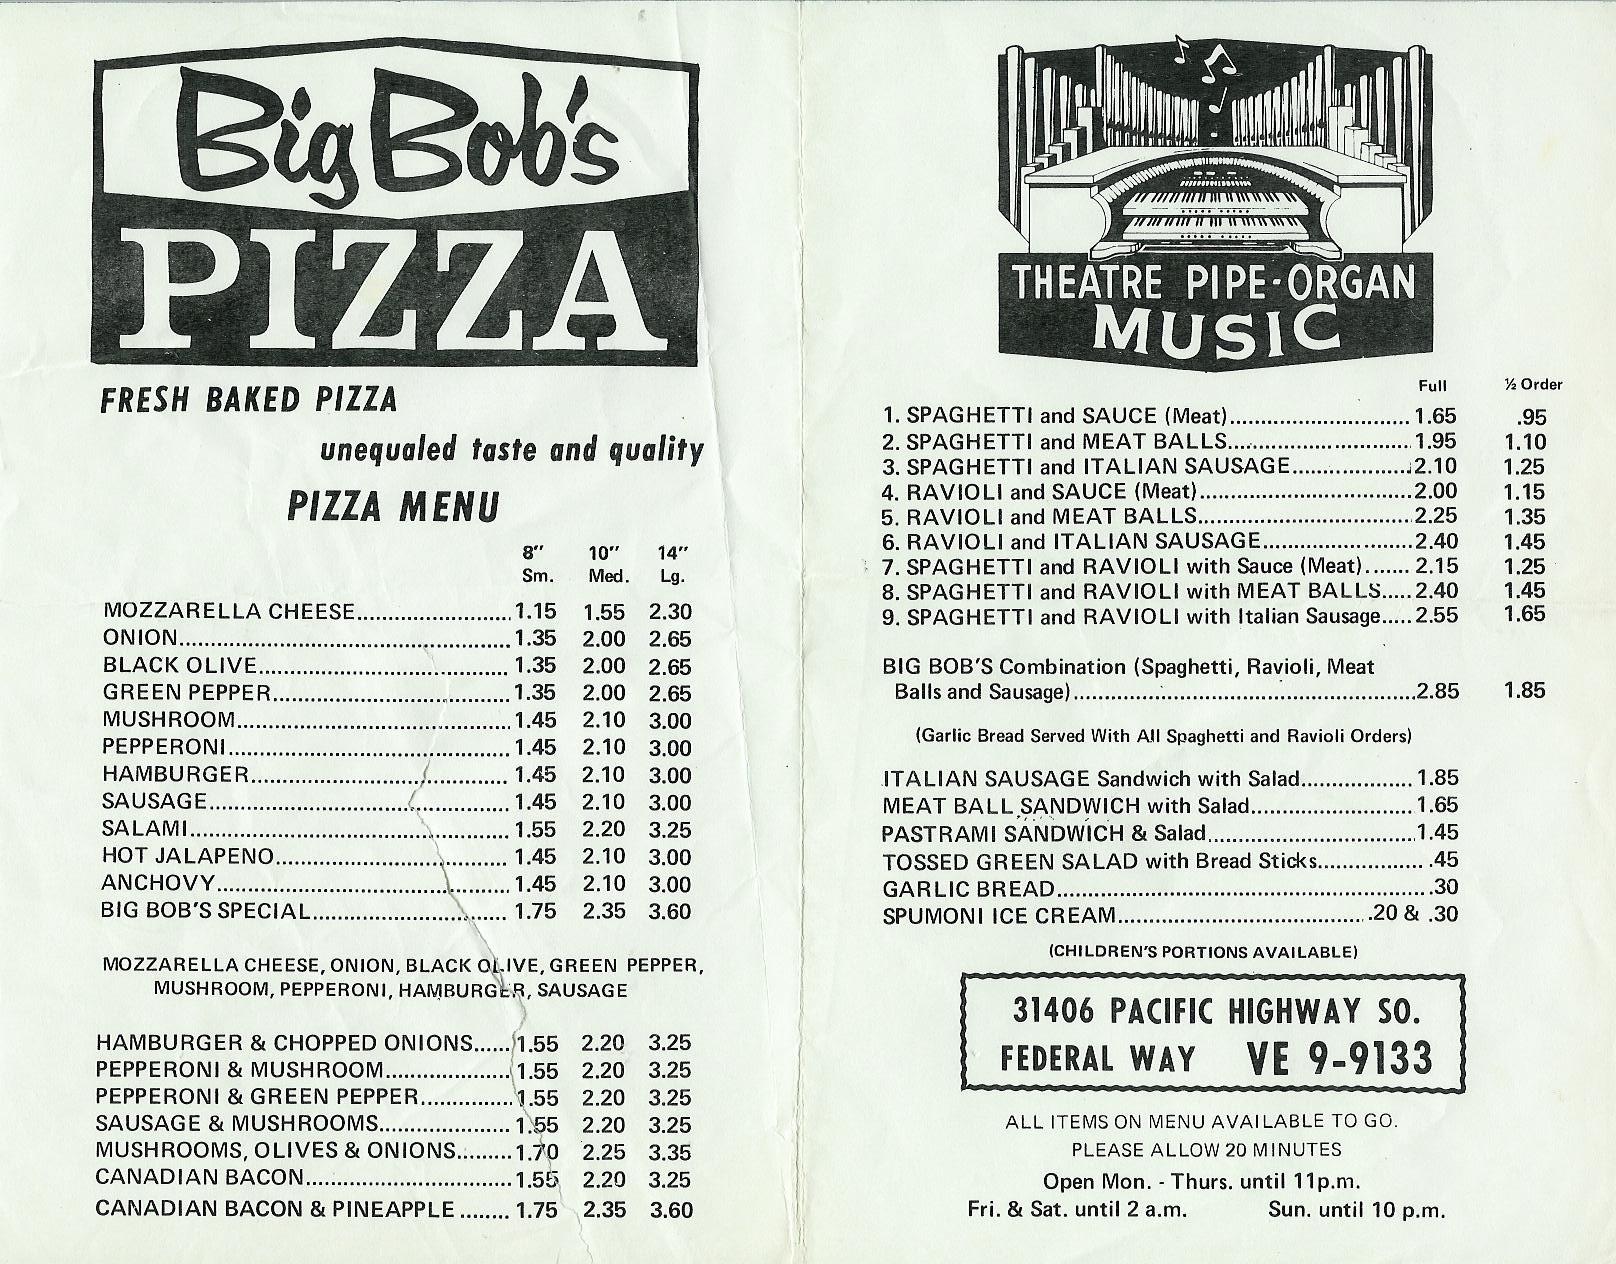 Big Bob's Pizza, Federal Way, Washington, c.1970s